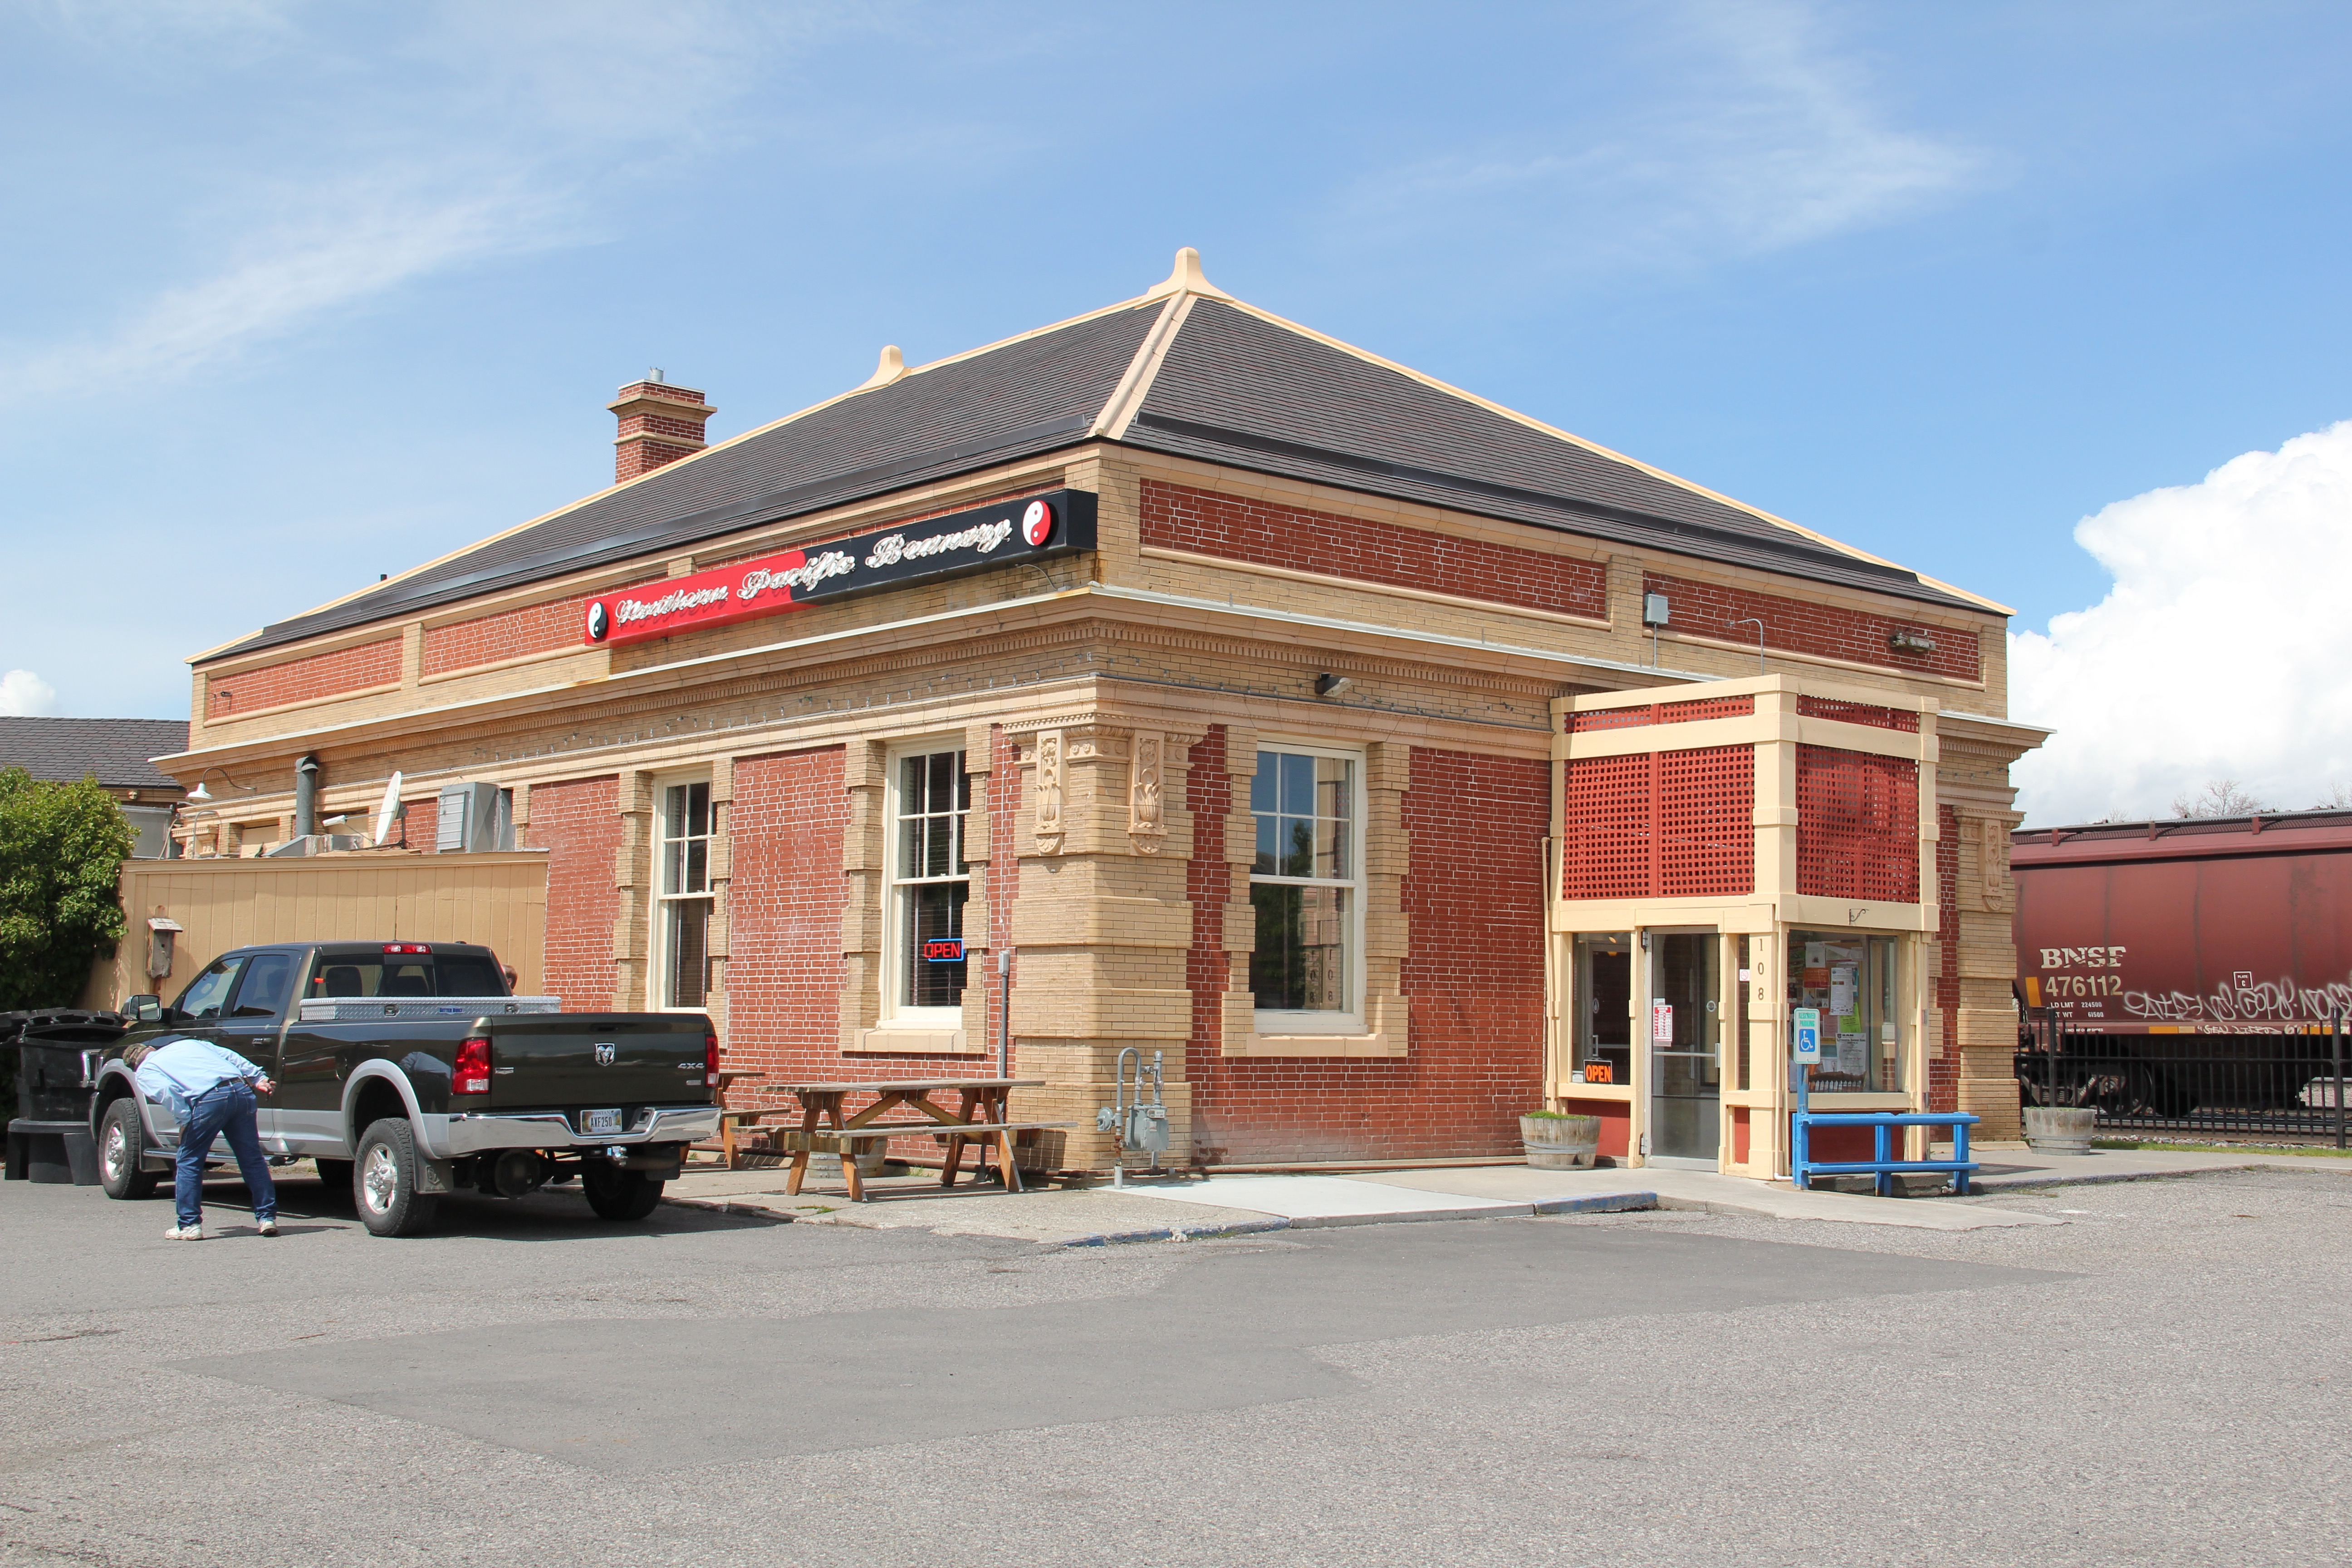 Park Co Livingston NP depot 11